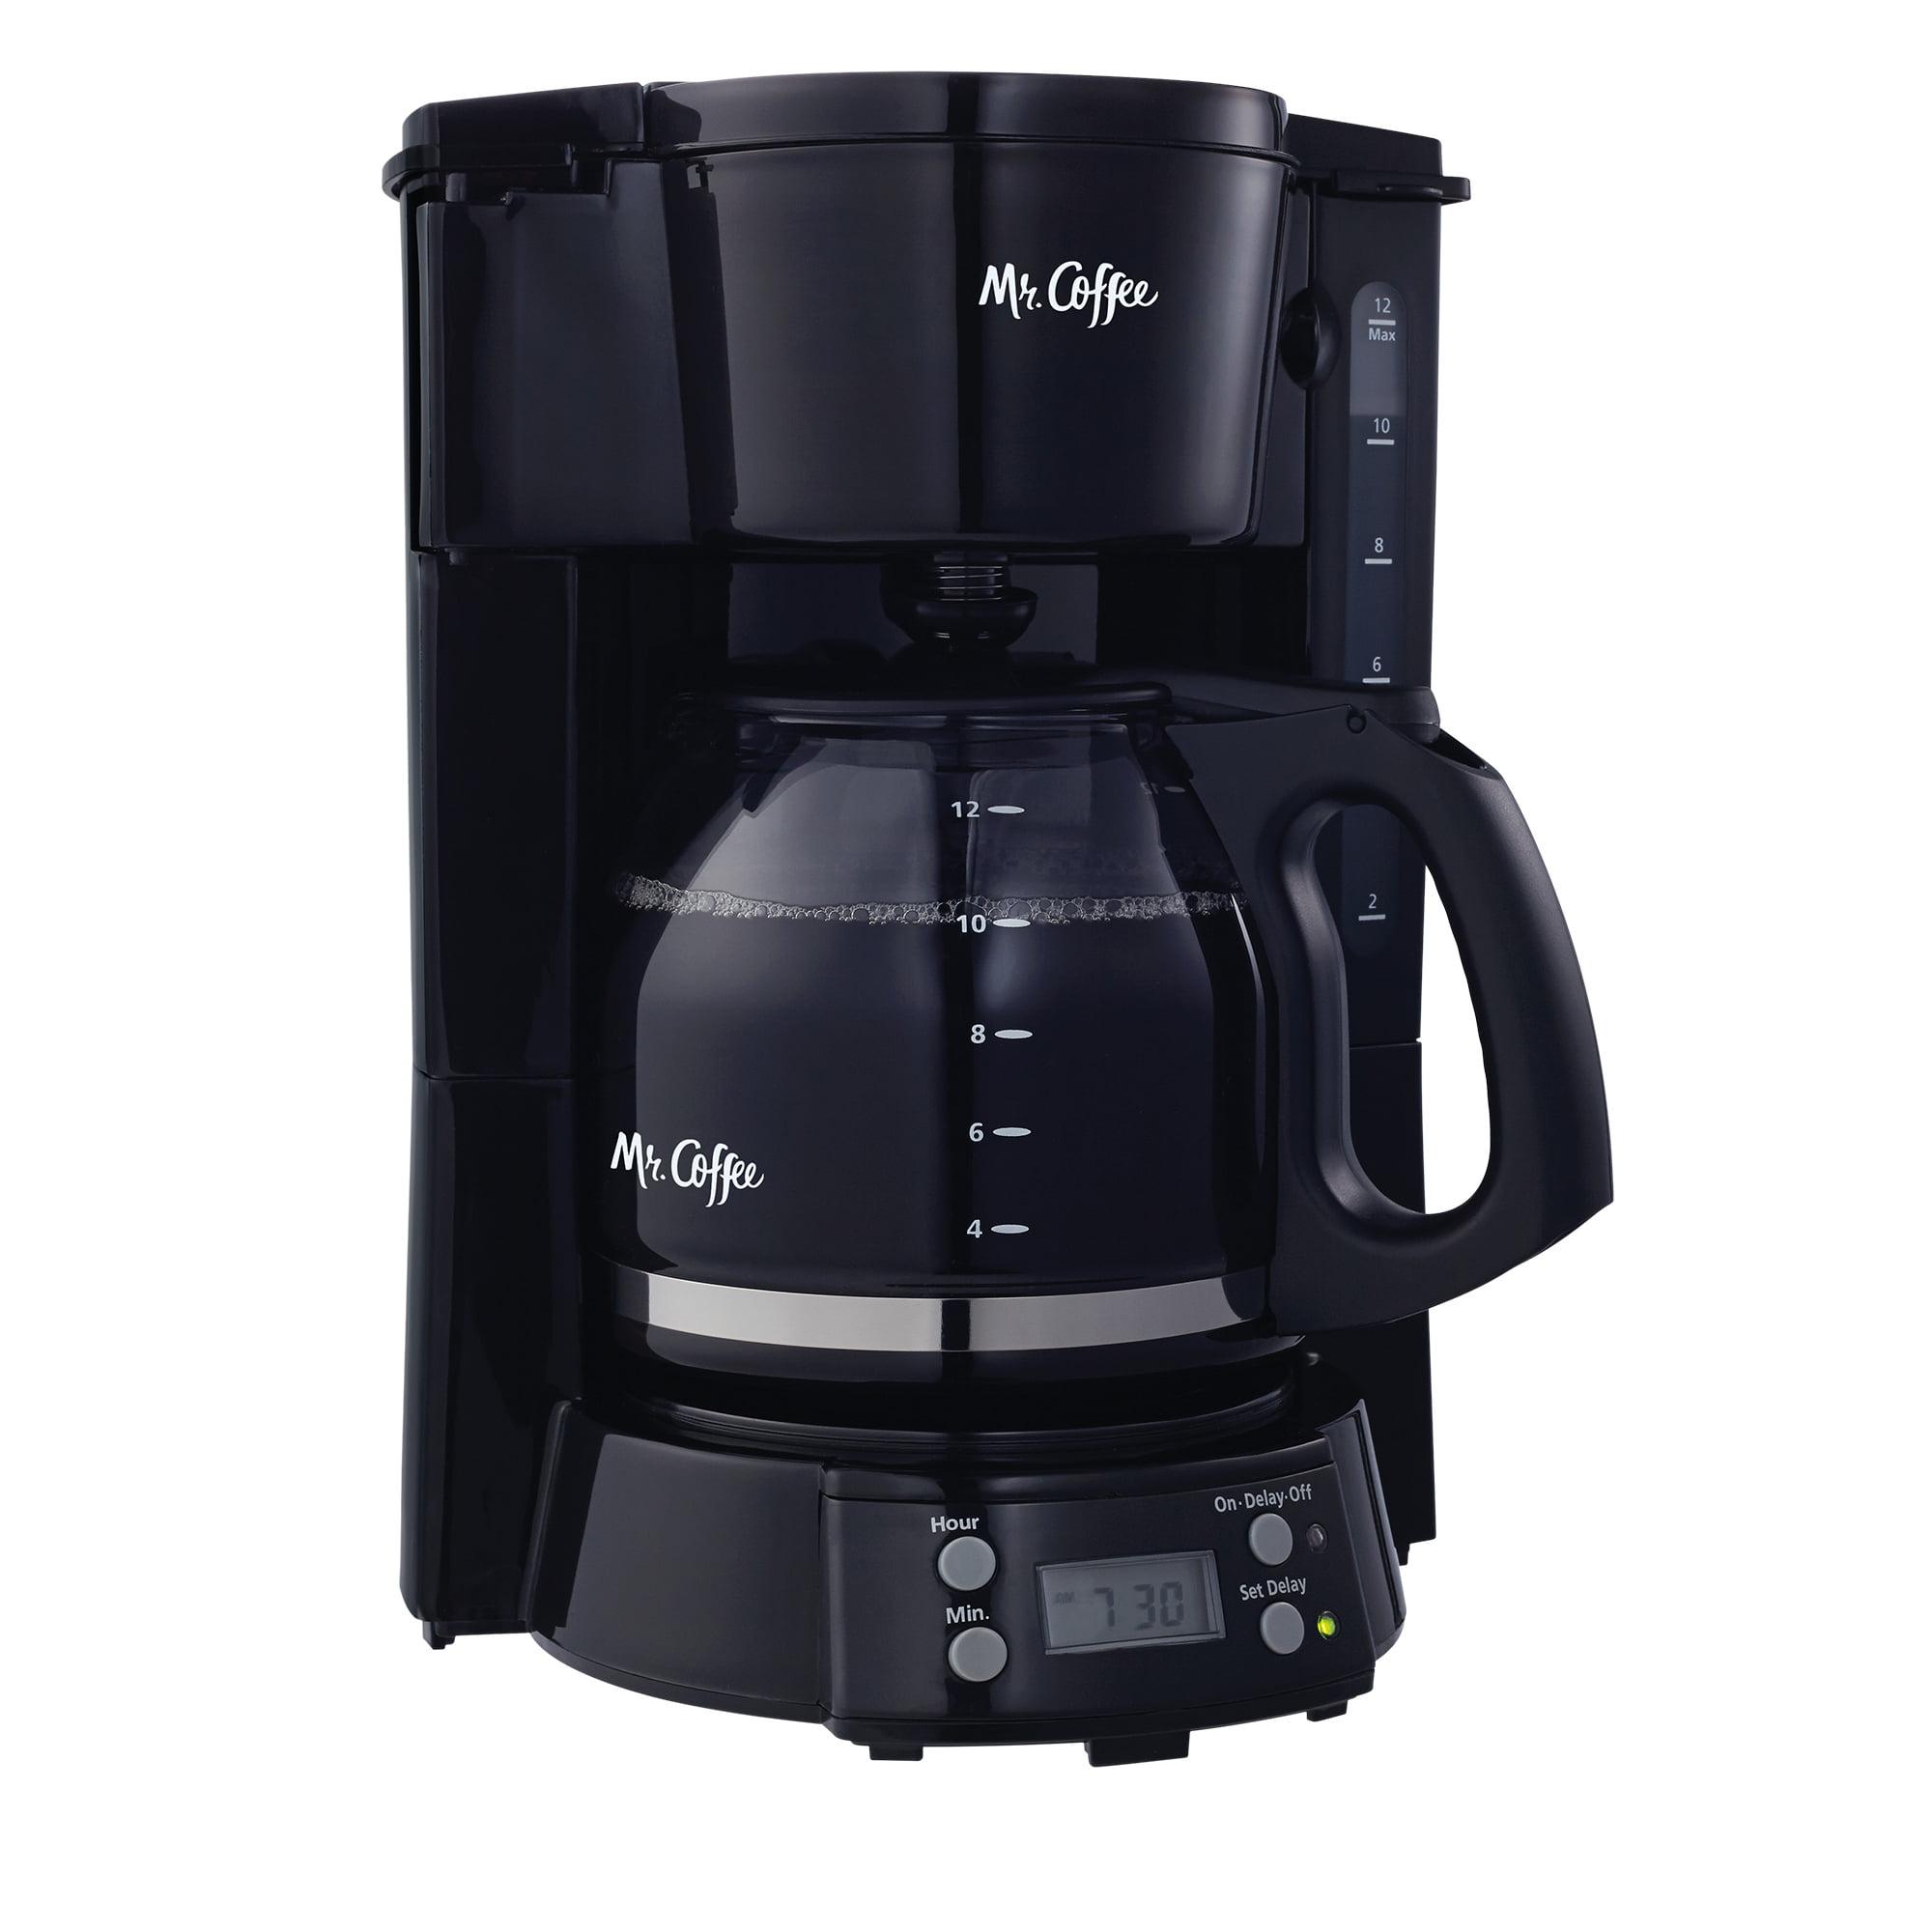 Mr. Coffee 12-Cup Programmable Coffee Maker - Black